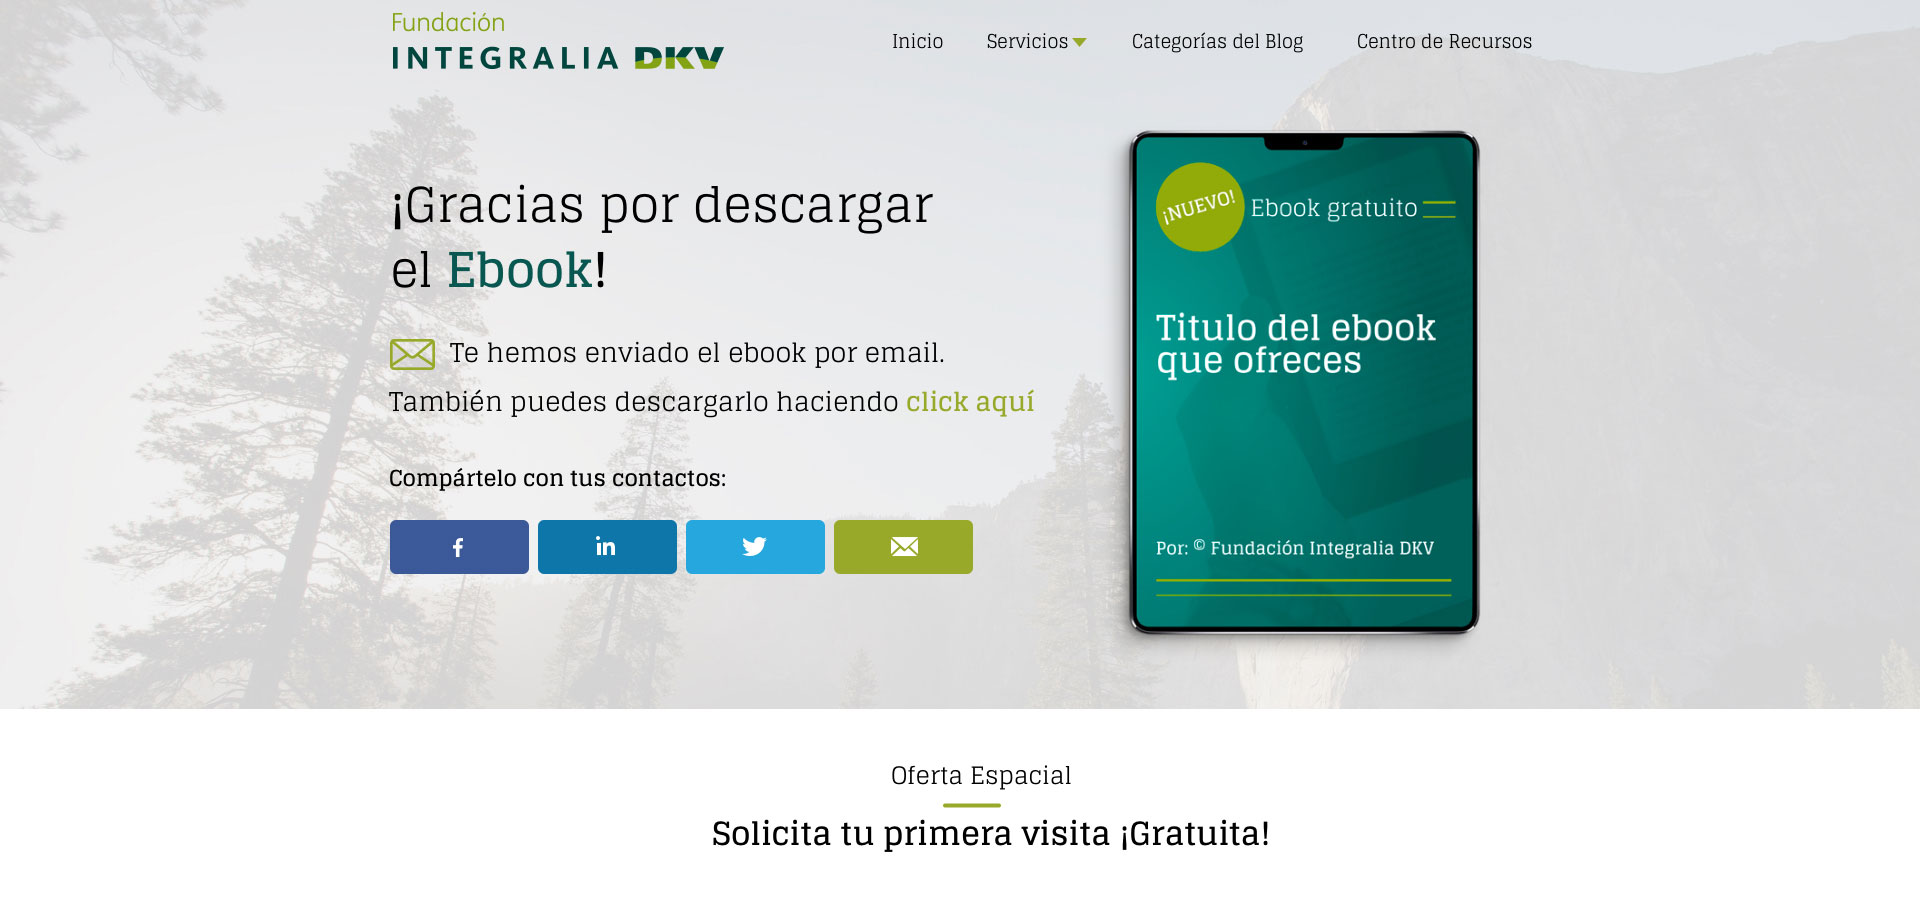 integralia-dkv-7